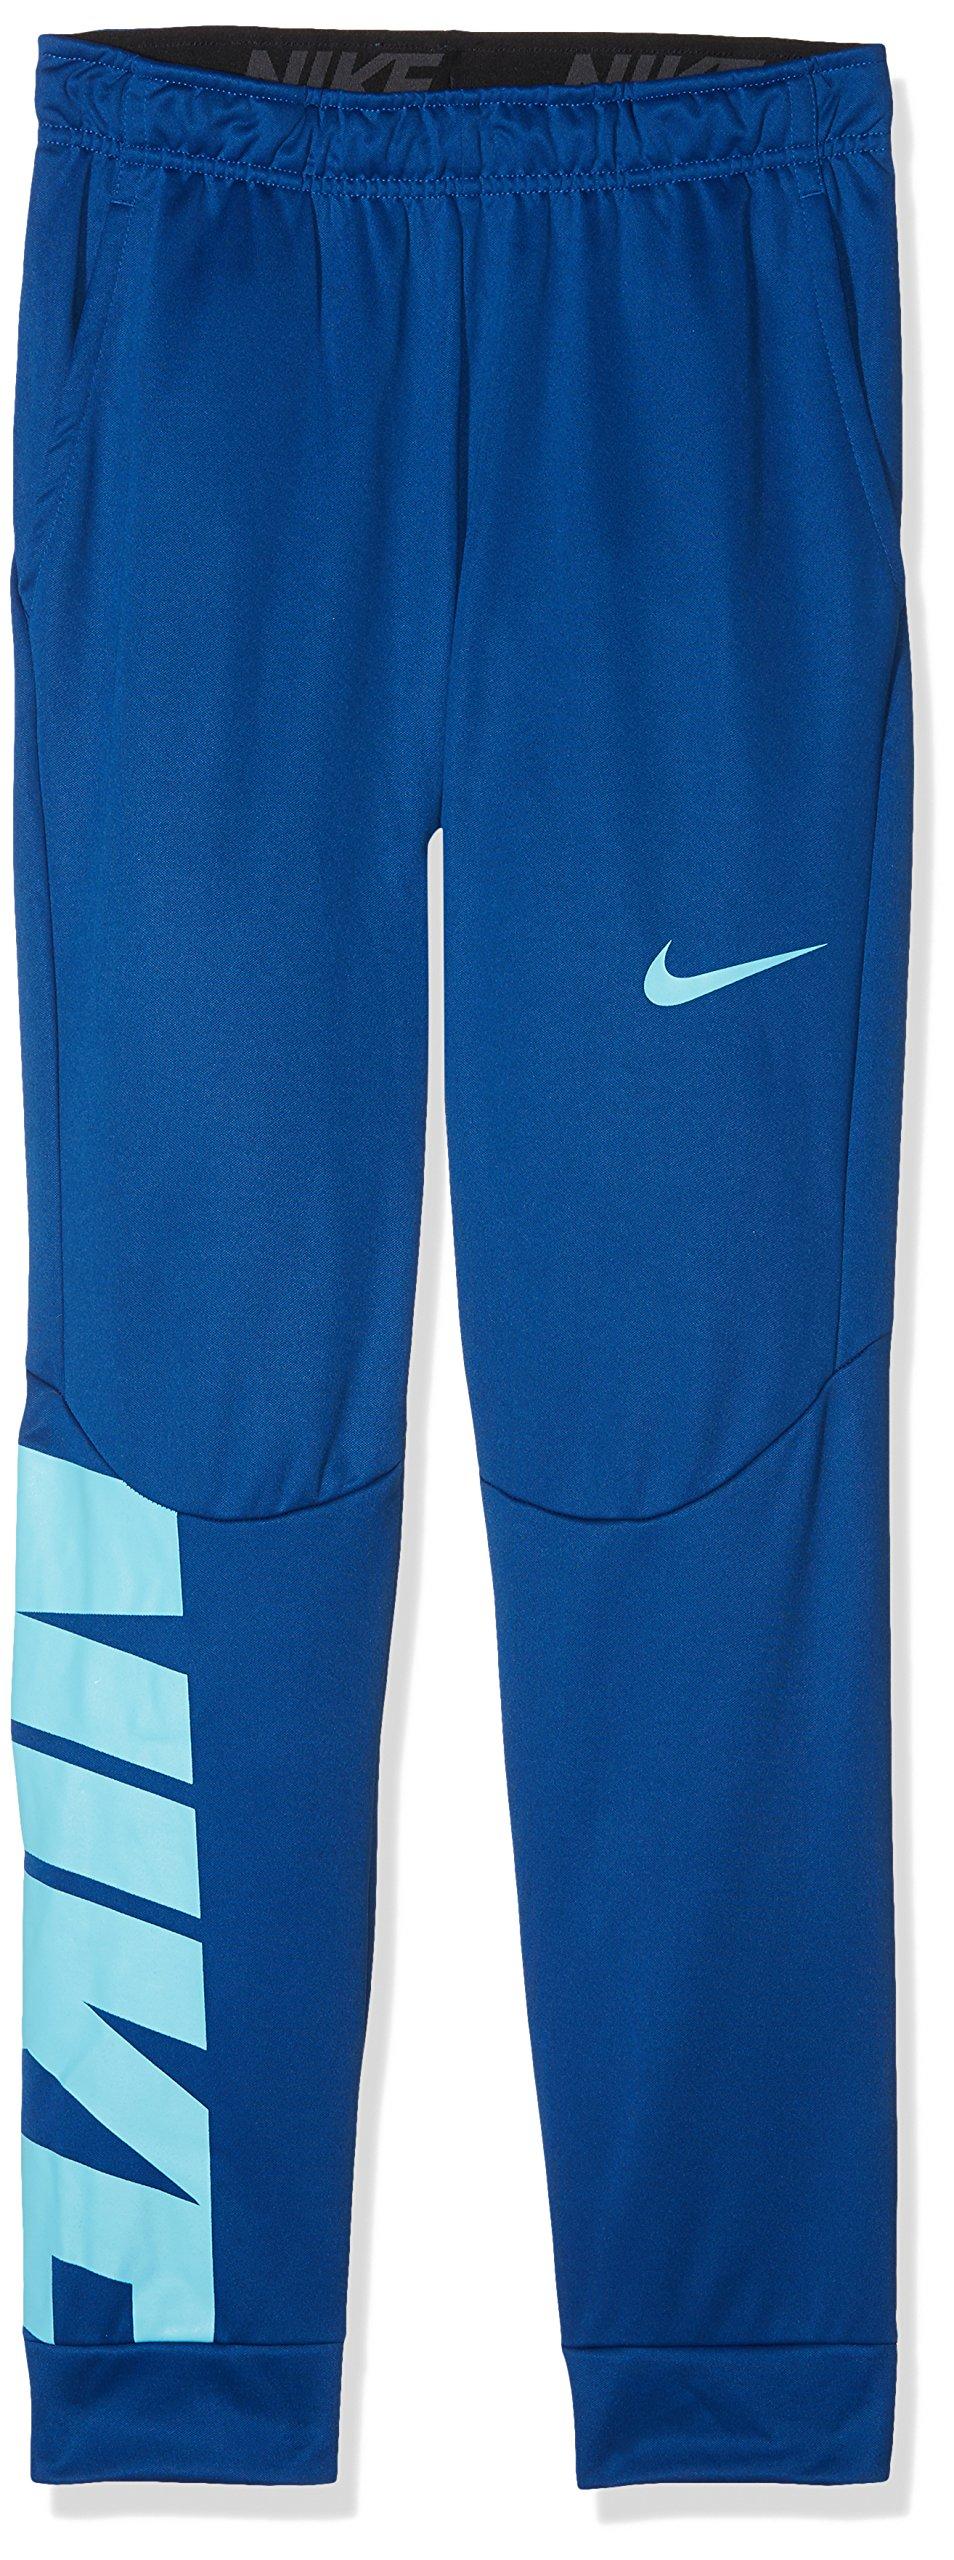 NIKE Big Kids' (Boys') Therma Printed Training Pants (Gym Blue (909082-431) / Water Blue, X-Large)